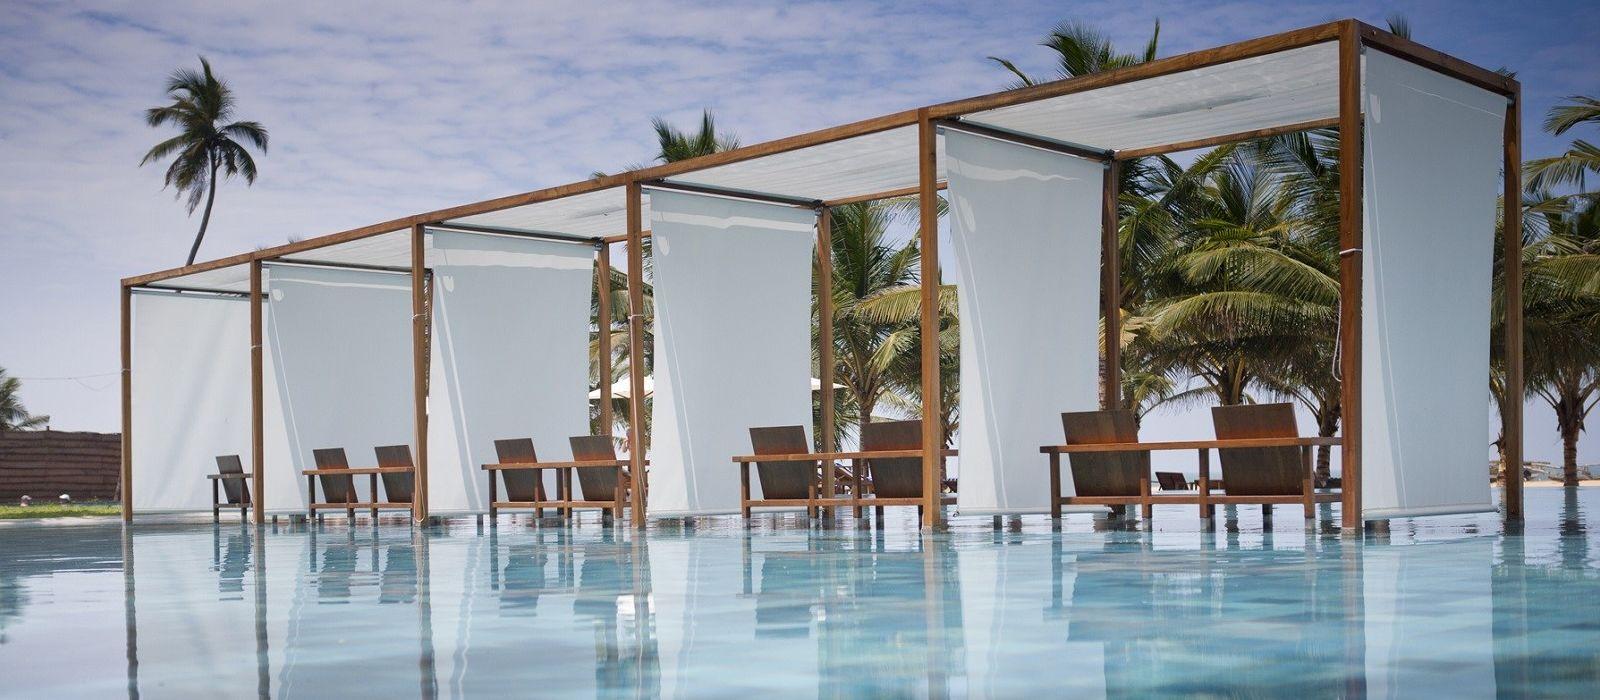 Jetwing Blue Oceanic Hotel In Sri Lanka Enchanting Travels